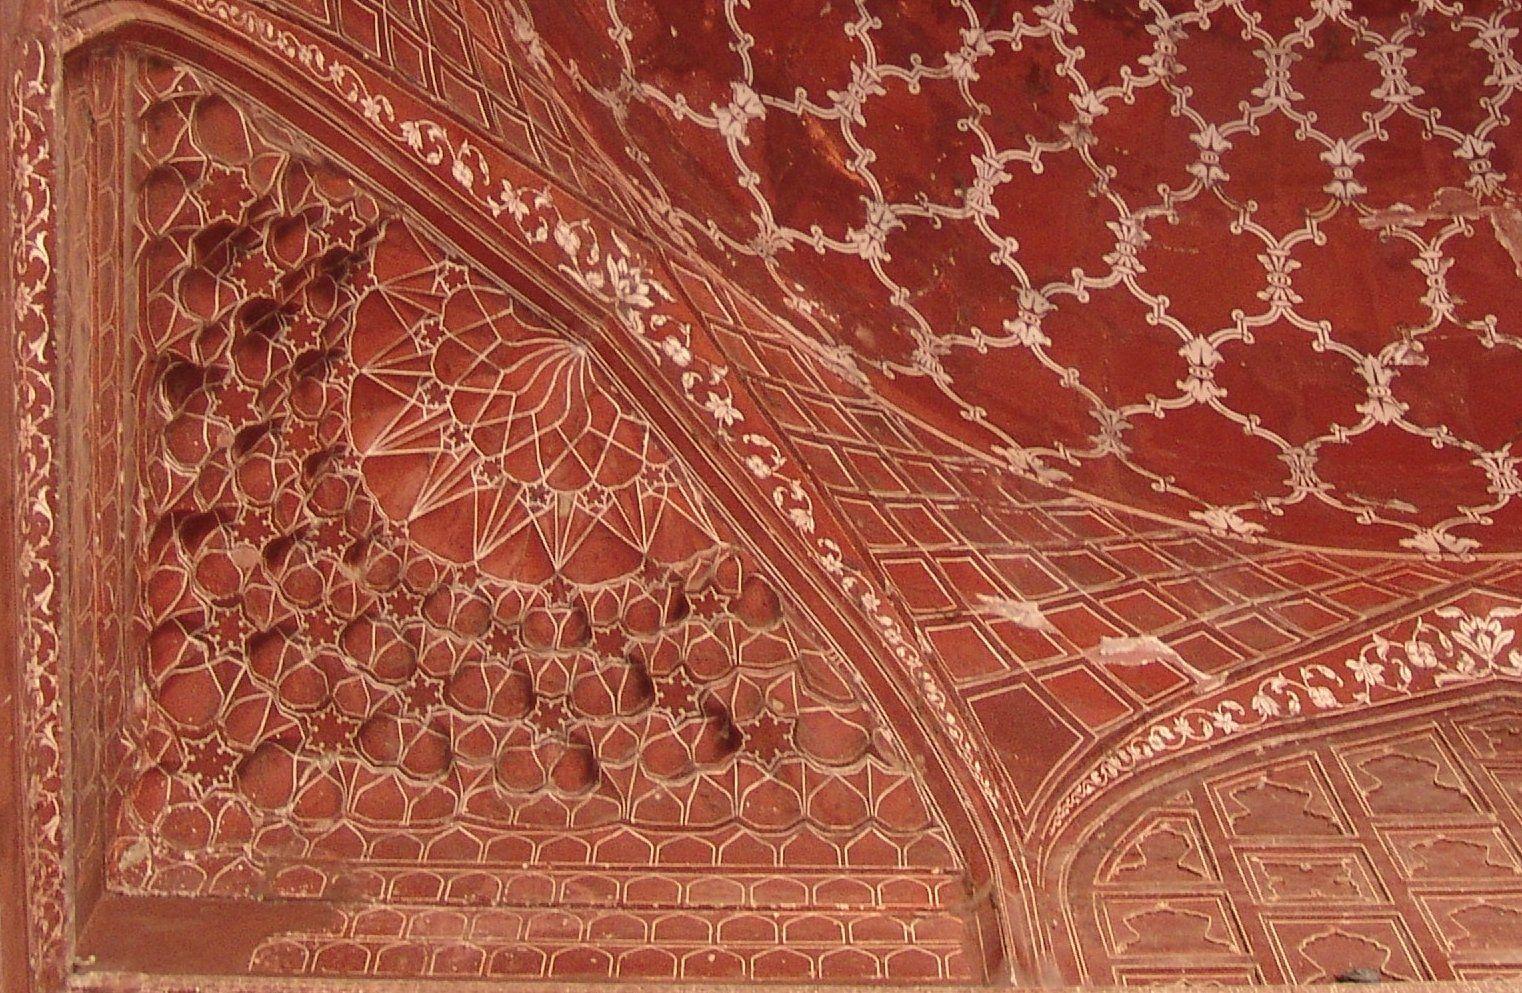 TajPaintedGeometry - Агра Тадж Махал | Тадж махал, Агра ...